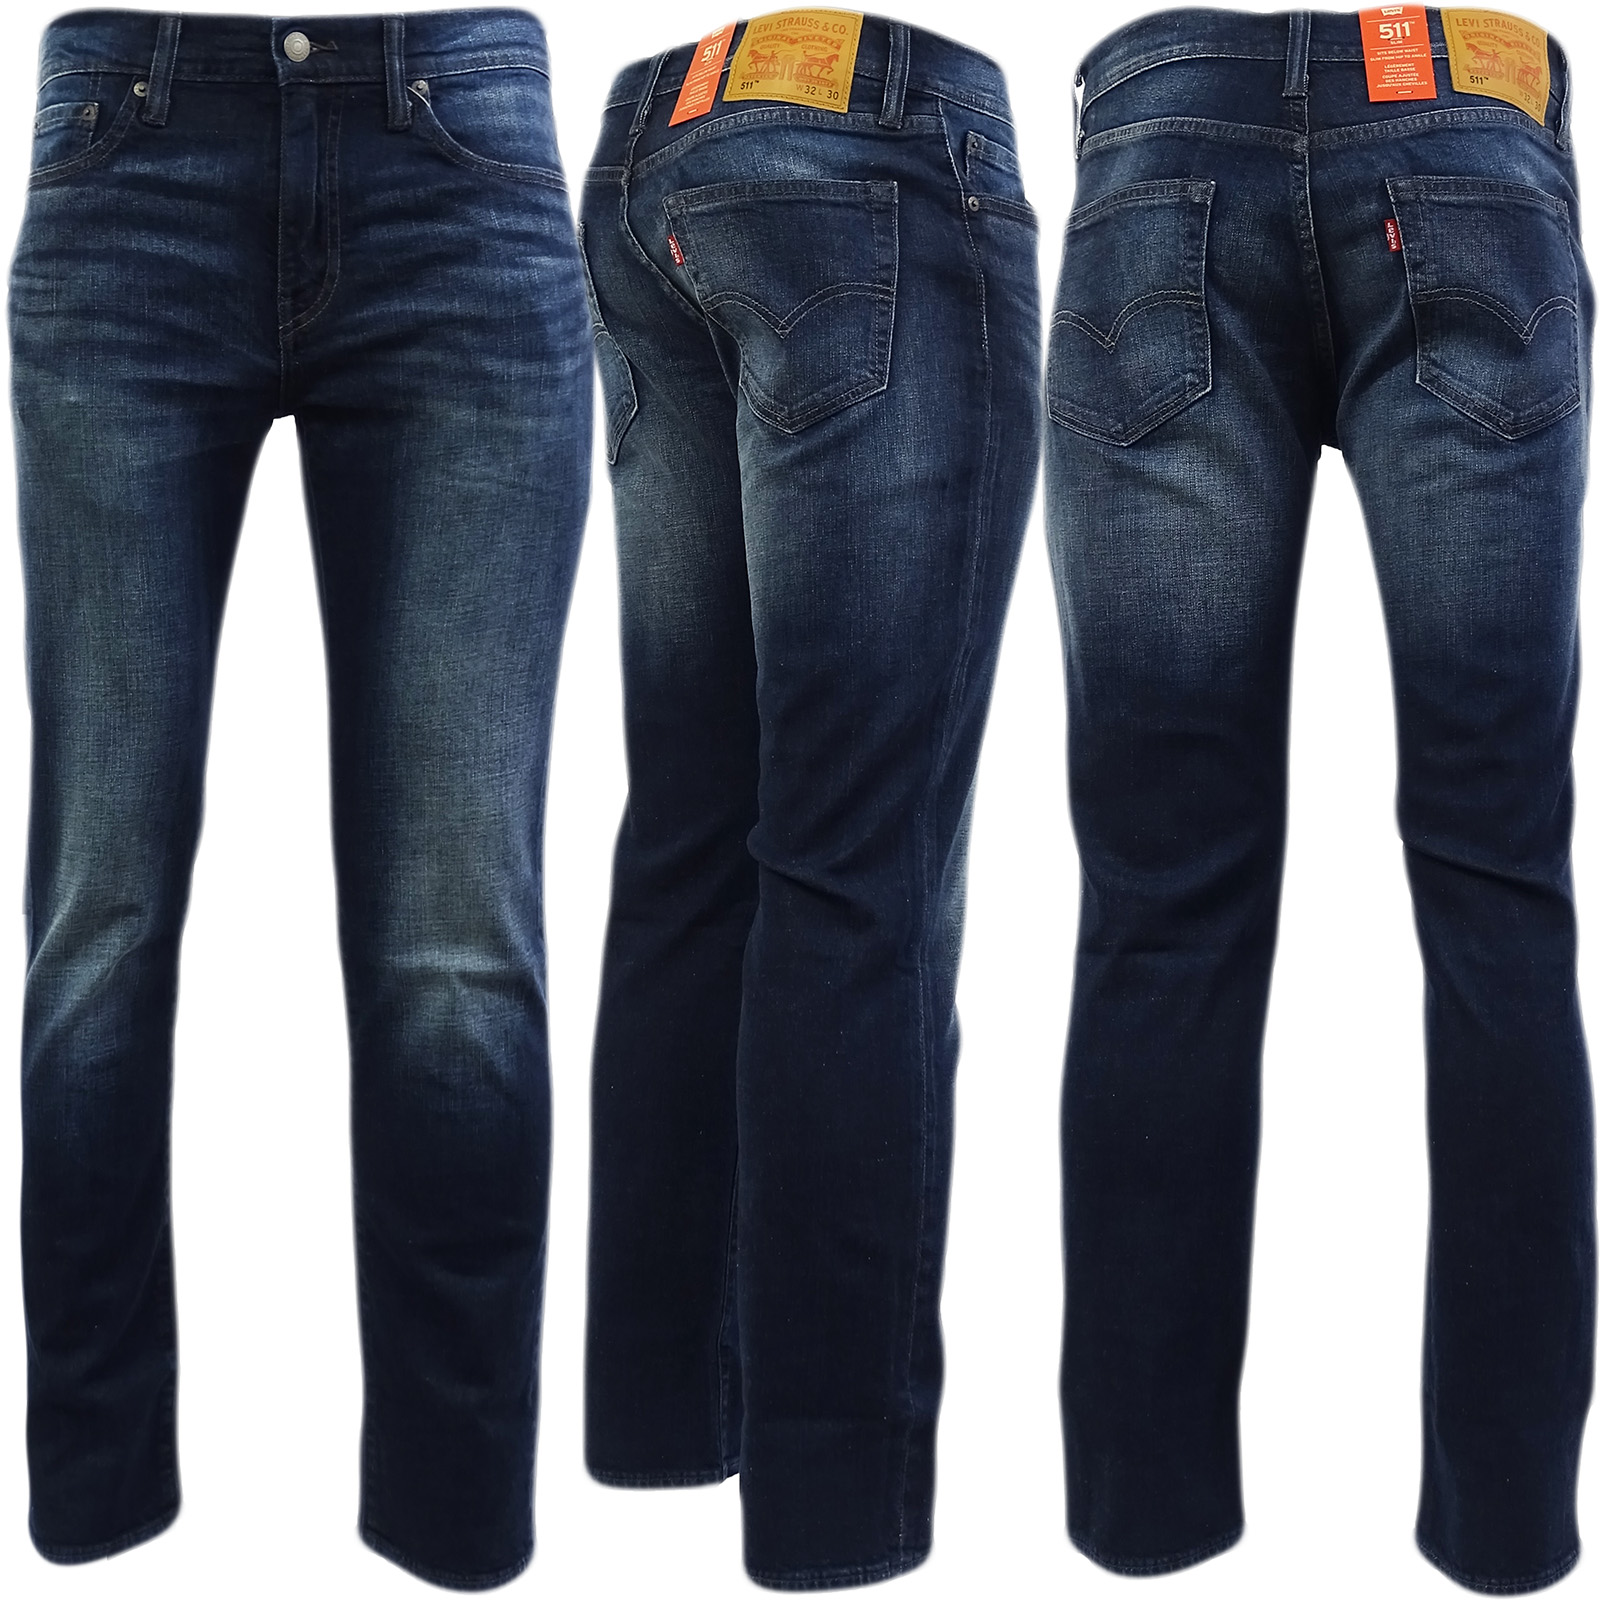 Levi-Strauss-511-Slim-Leg-Jean-Indigo-Blue-